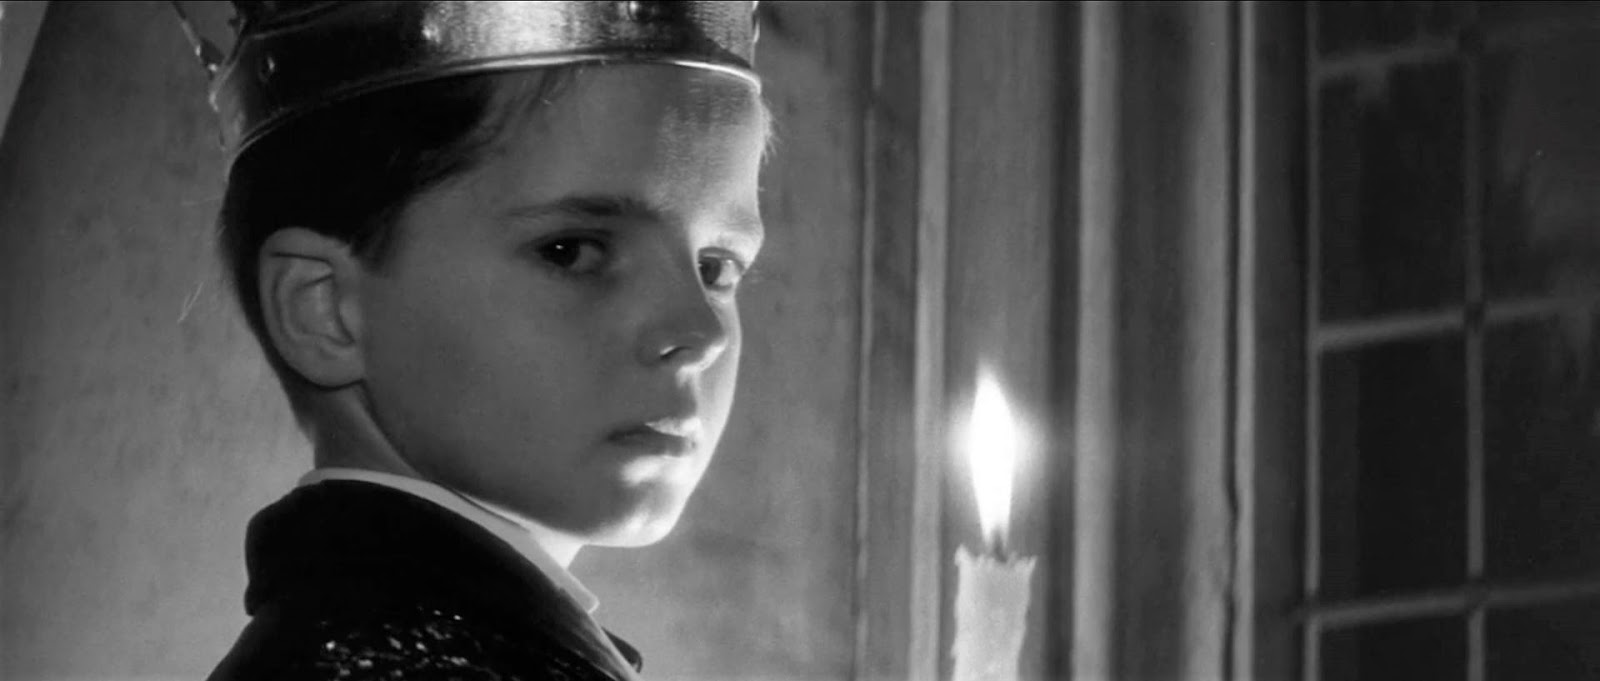 [Image: Martin-Stephens-Innocents-1961%2B.JPG]